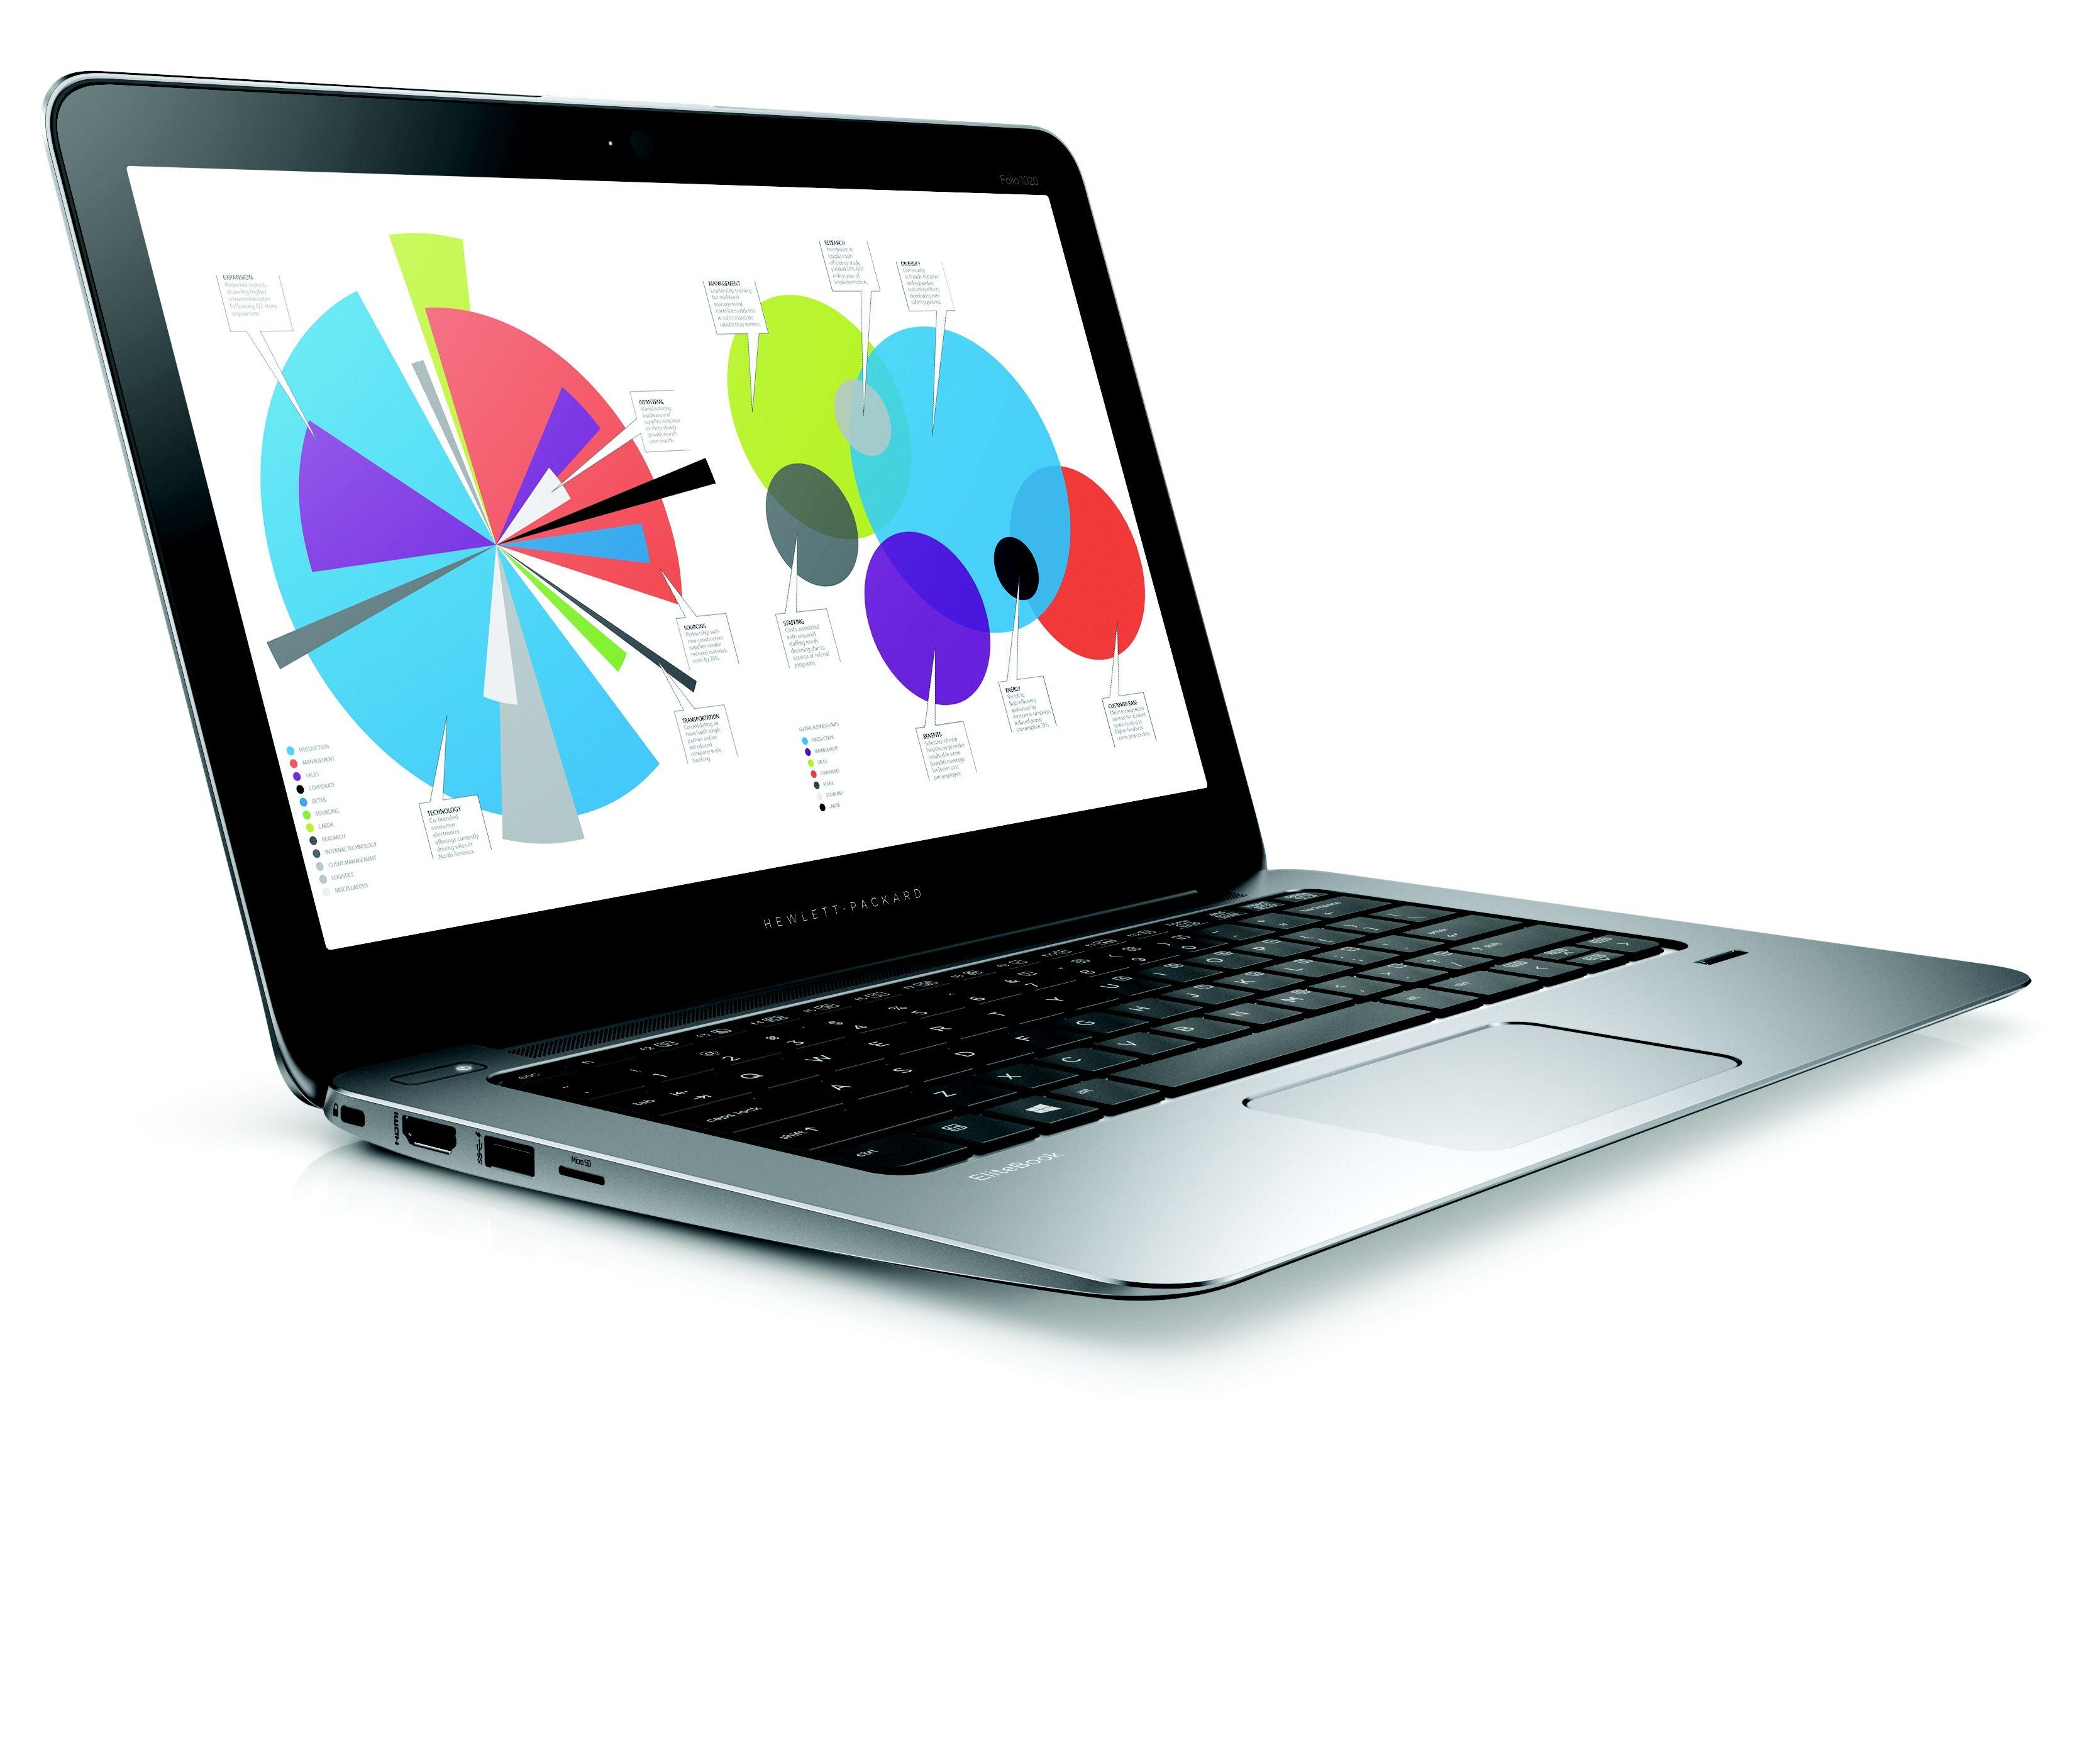 HP Folio 1020 G1 12.5 QHD TOUCH/M-5Y51/8G/256SSD/HDMI/MCR/WIFI/BT/NFC/MCR/FPR/3Rservis/W8.1P